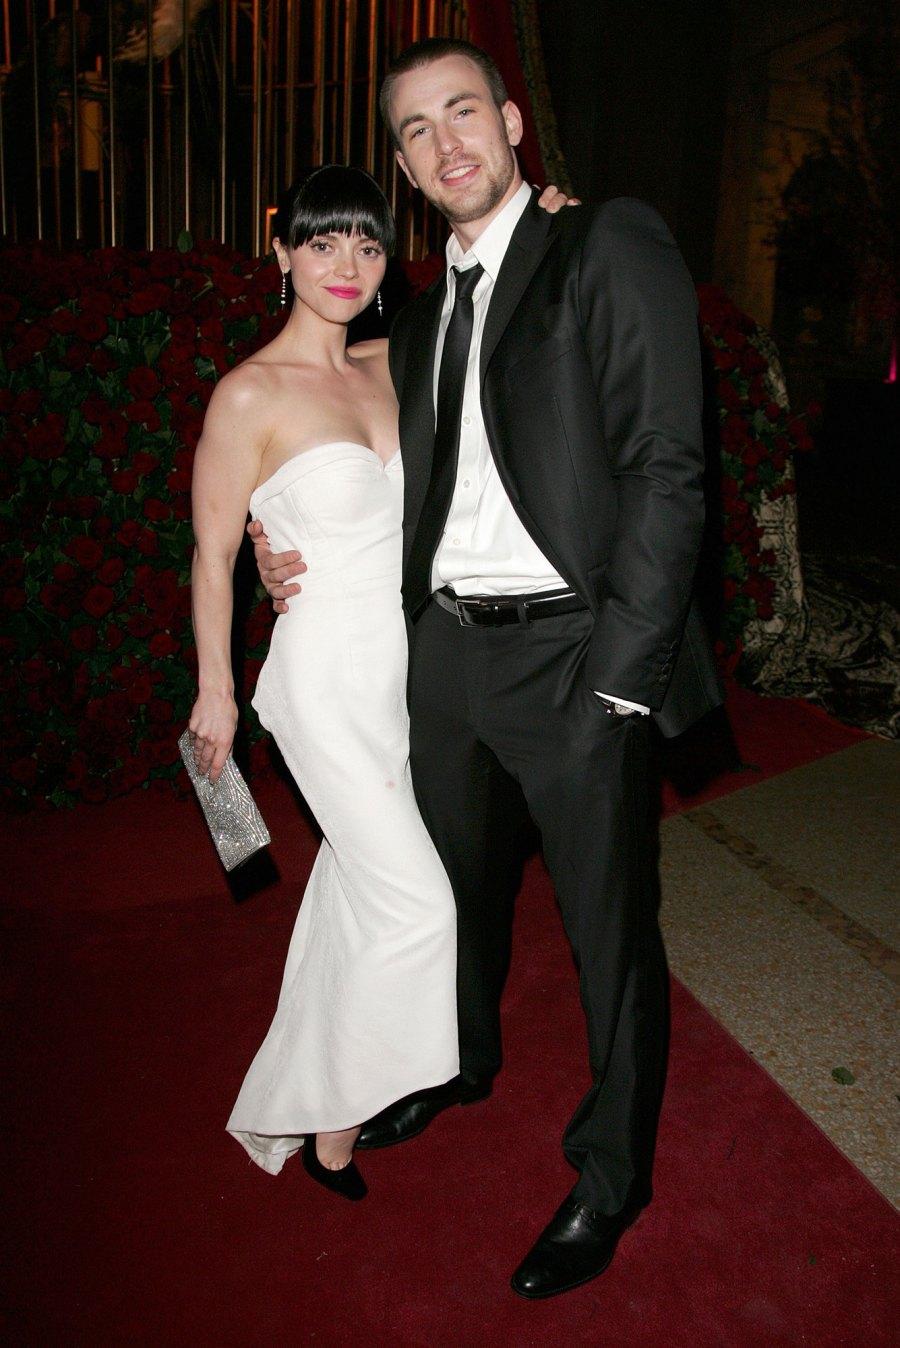 Christina Ricci 2007 Chris Evans Complete Dating History